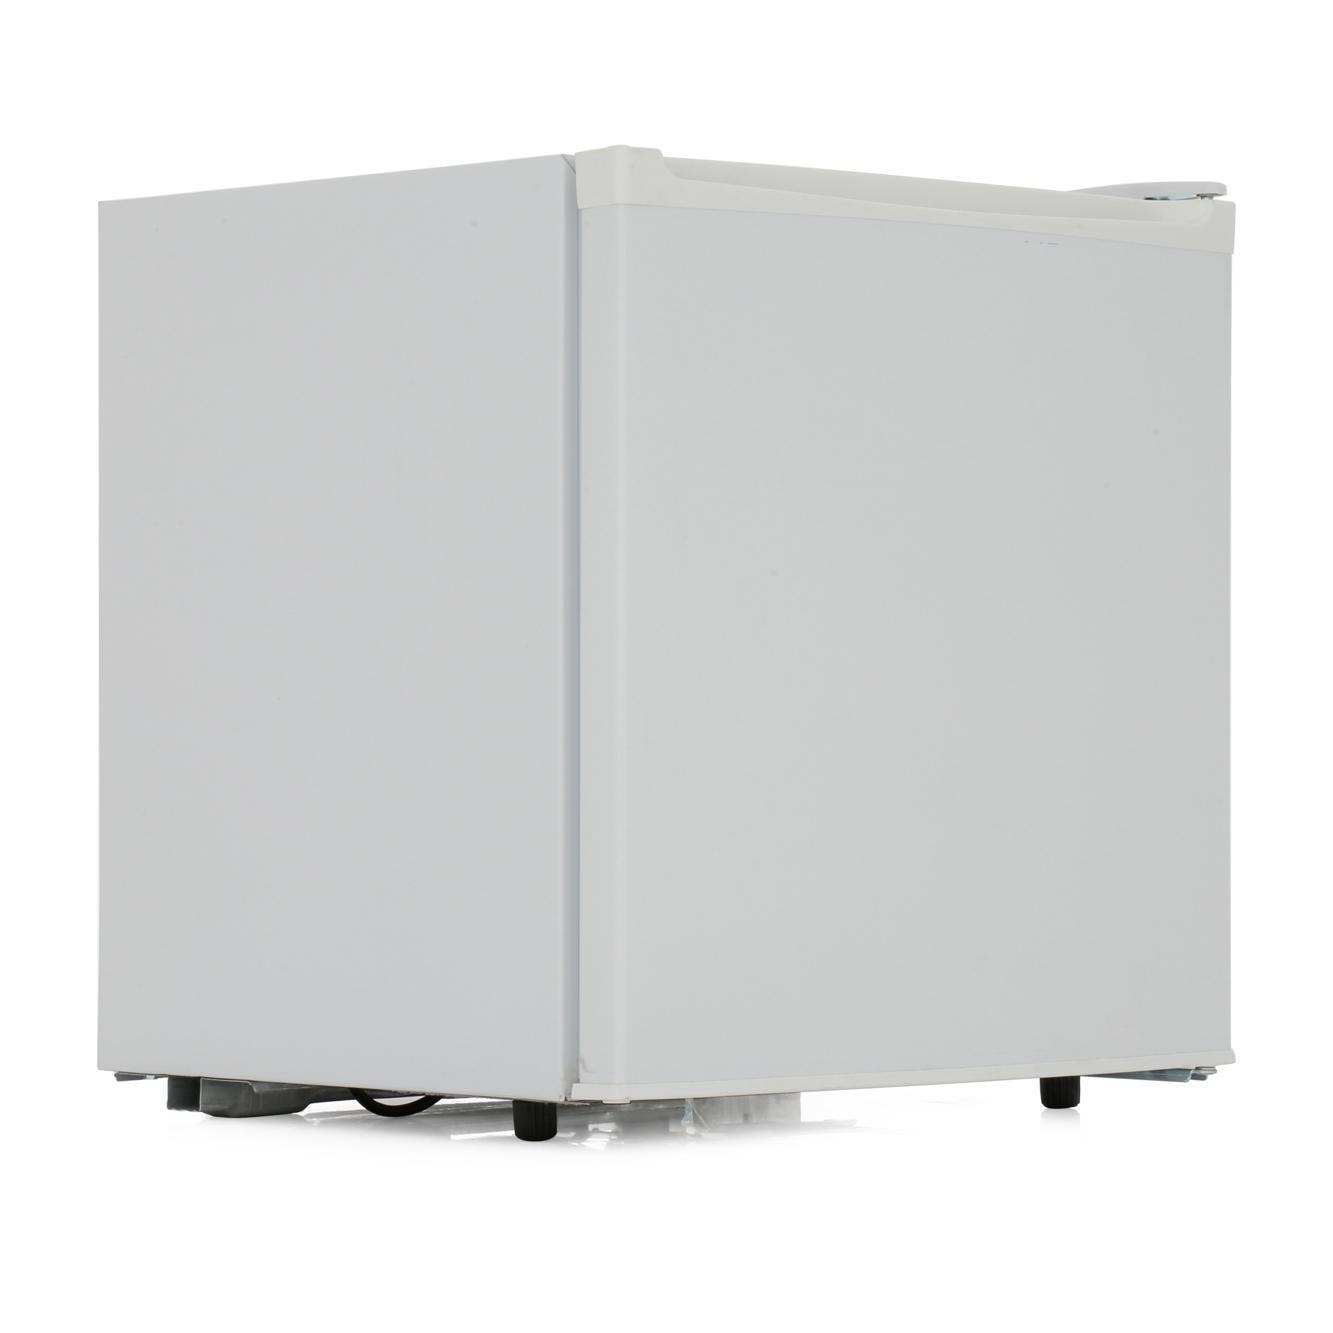 Amica FZ0413 Compact Freezer